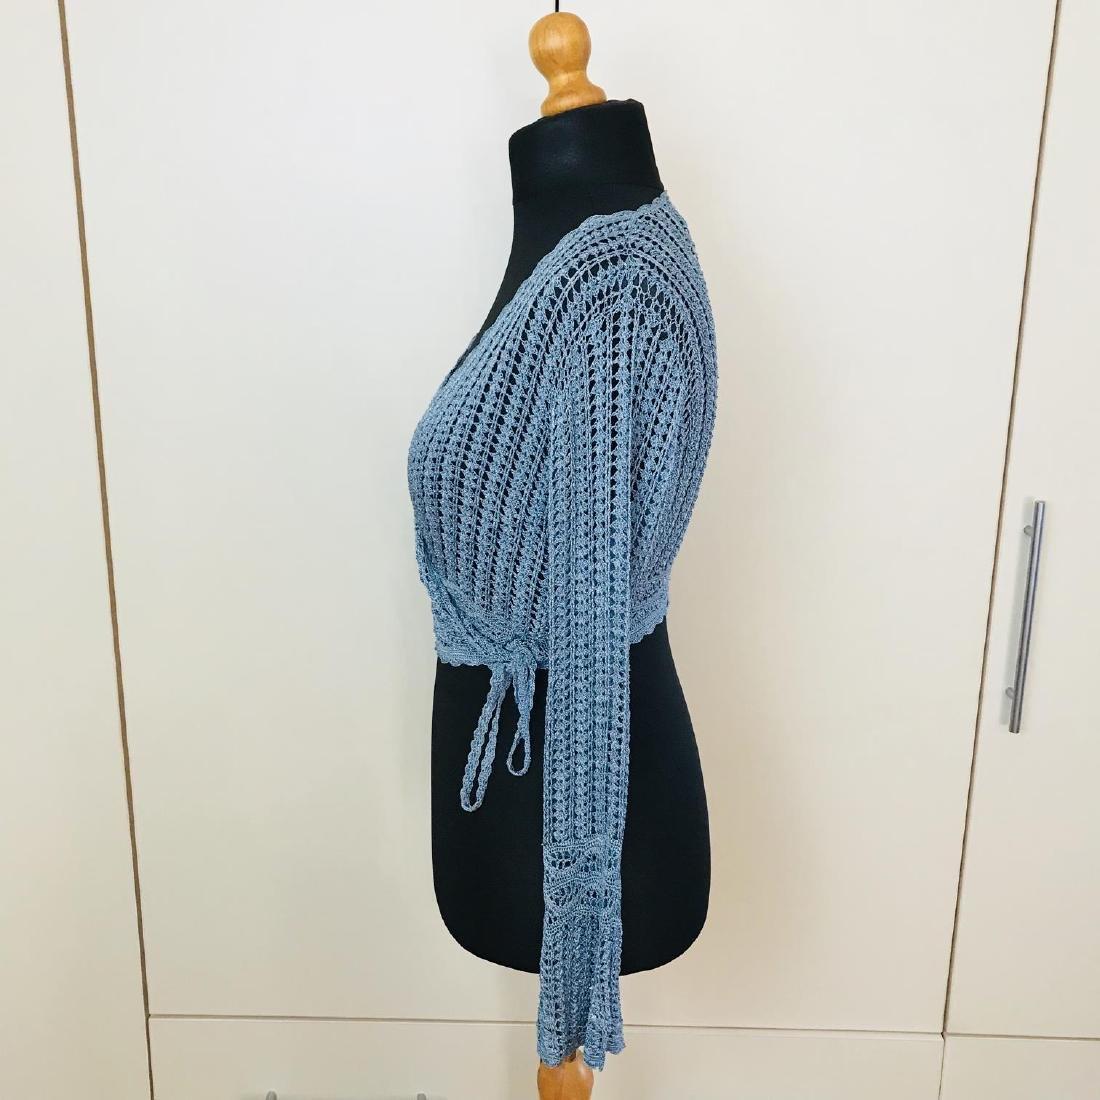 Vintage Women's Designer Sweater Cardigan Top Size US 6 - 4